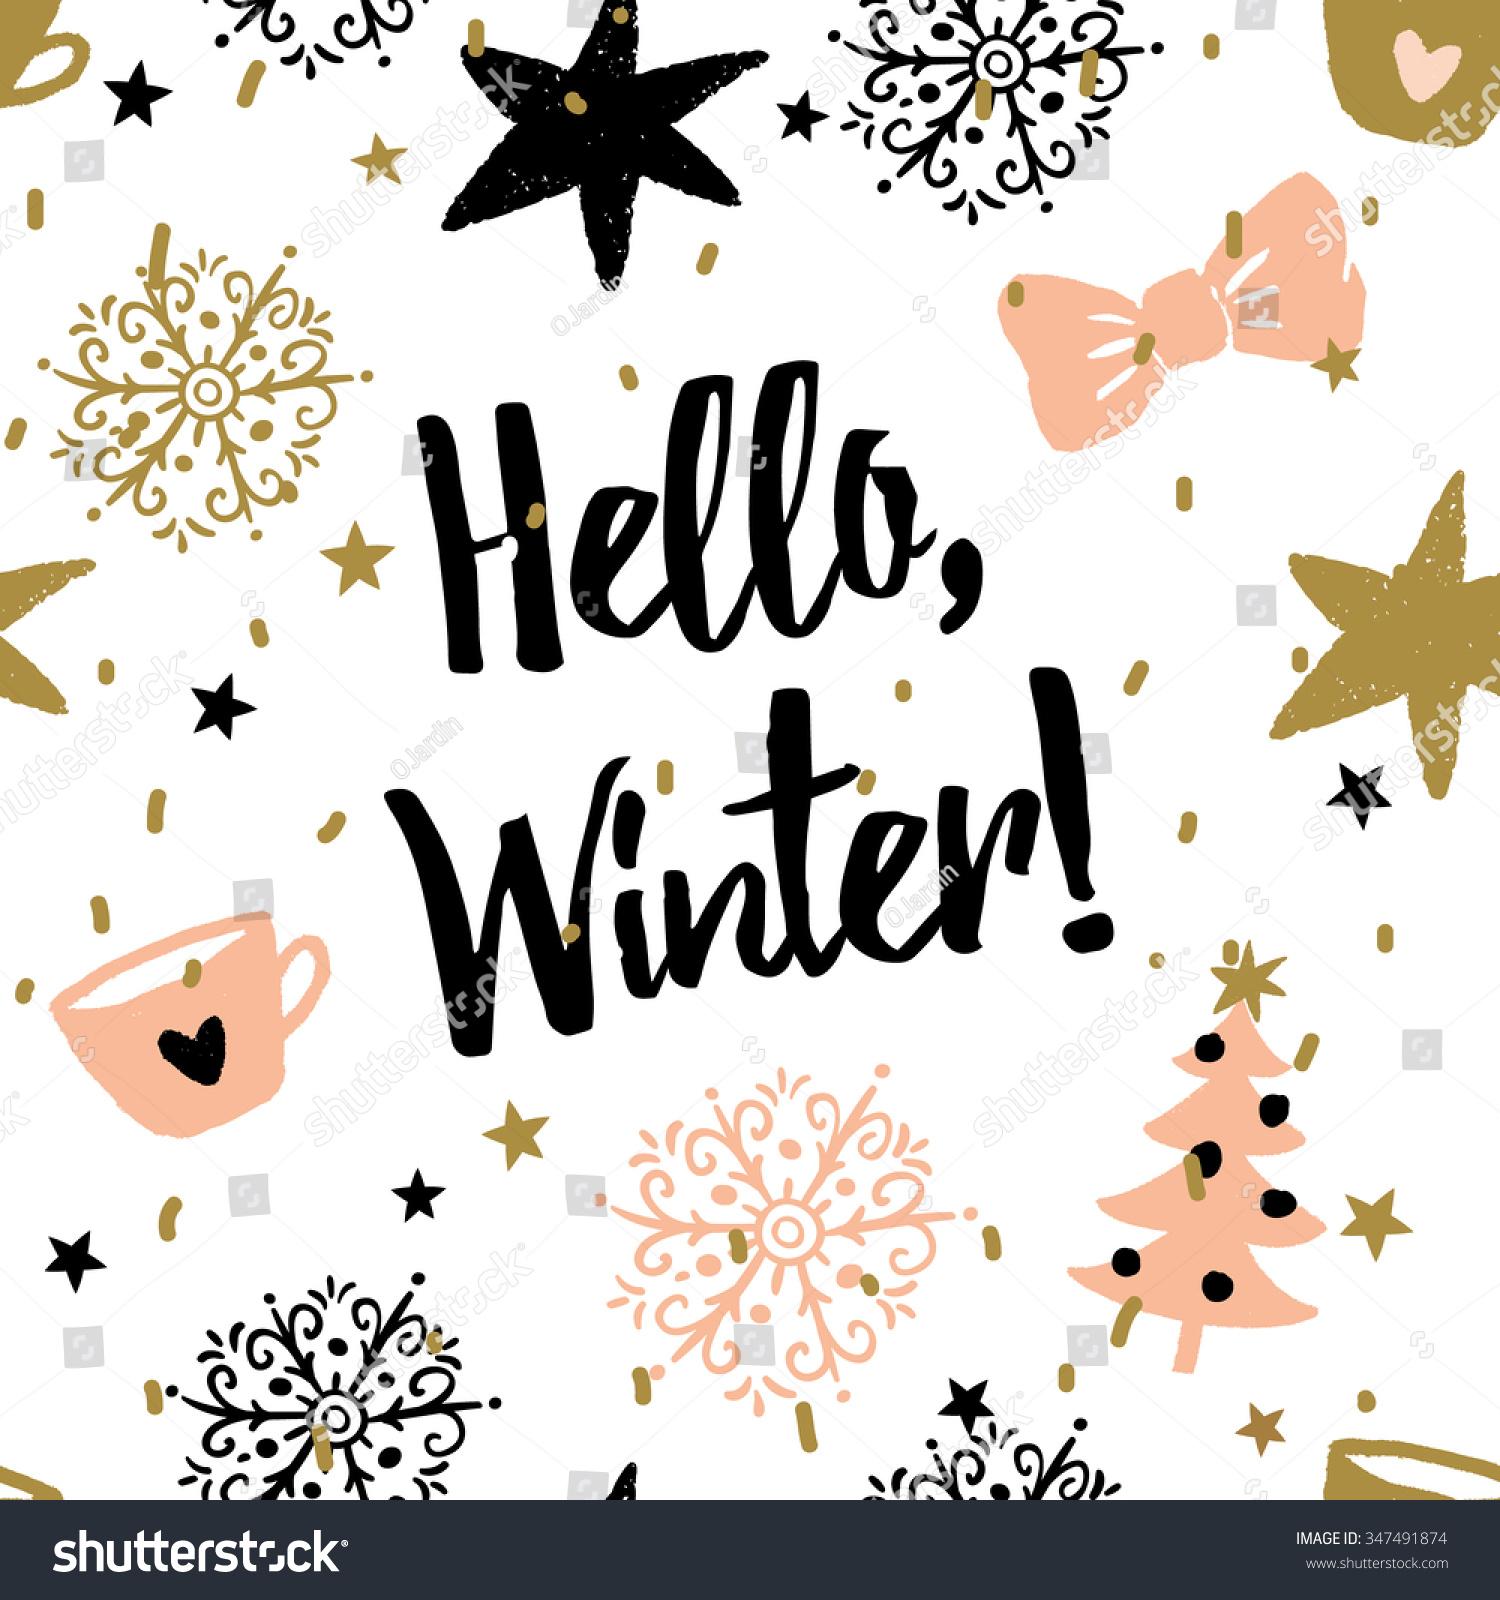 Cute Cupcake Wallpaper Christmas Illustration Message Hello Winter Vector Stock